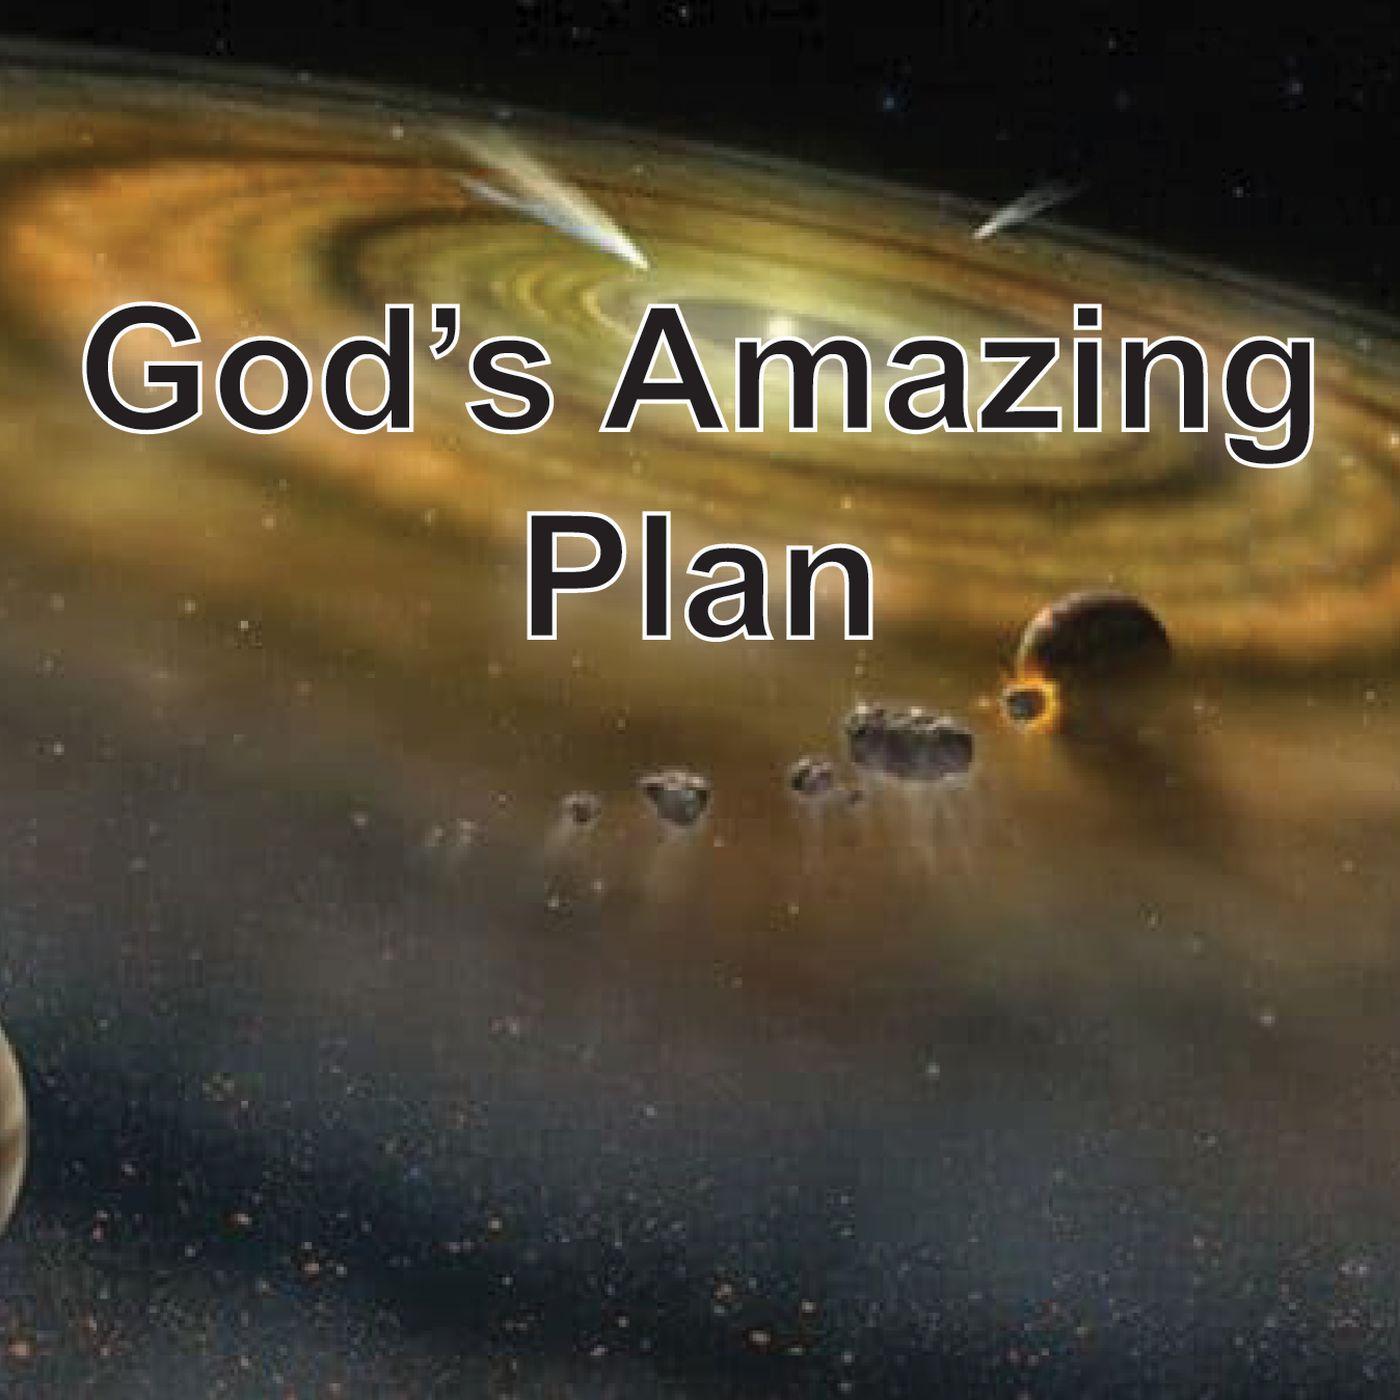 God's Amazing Plan